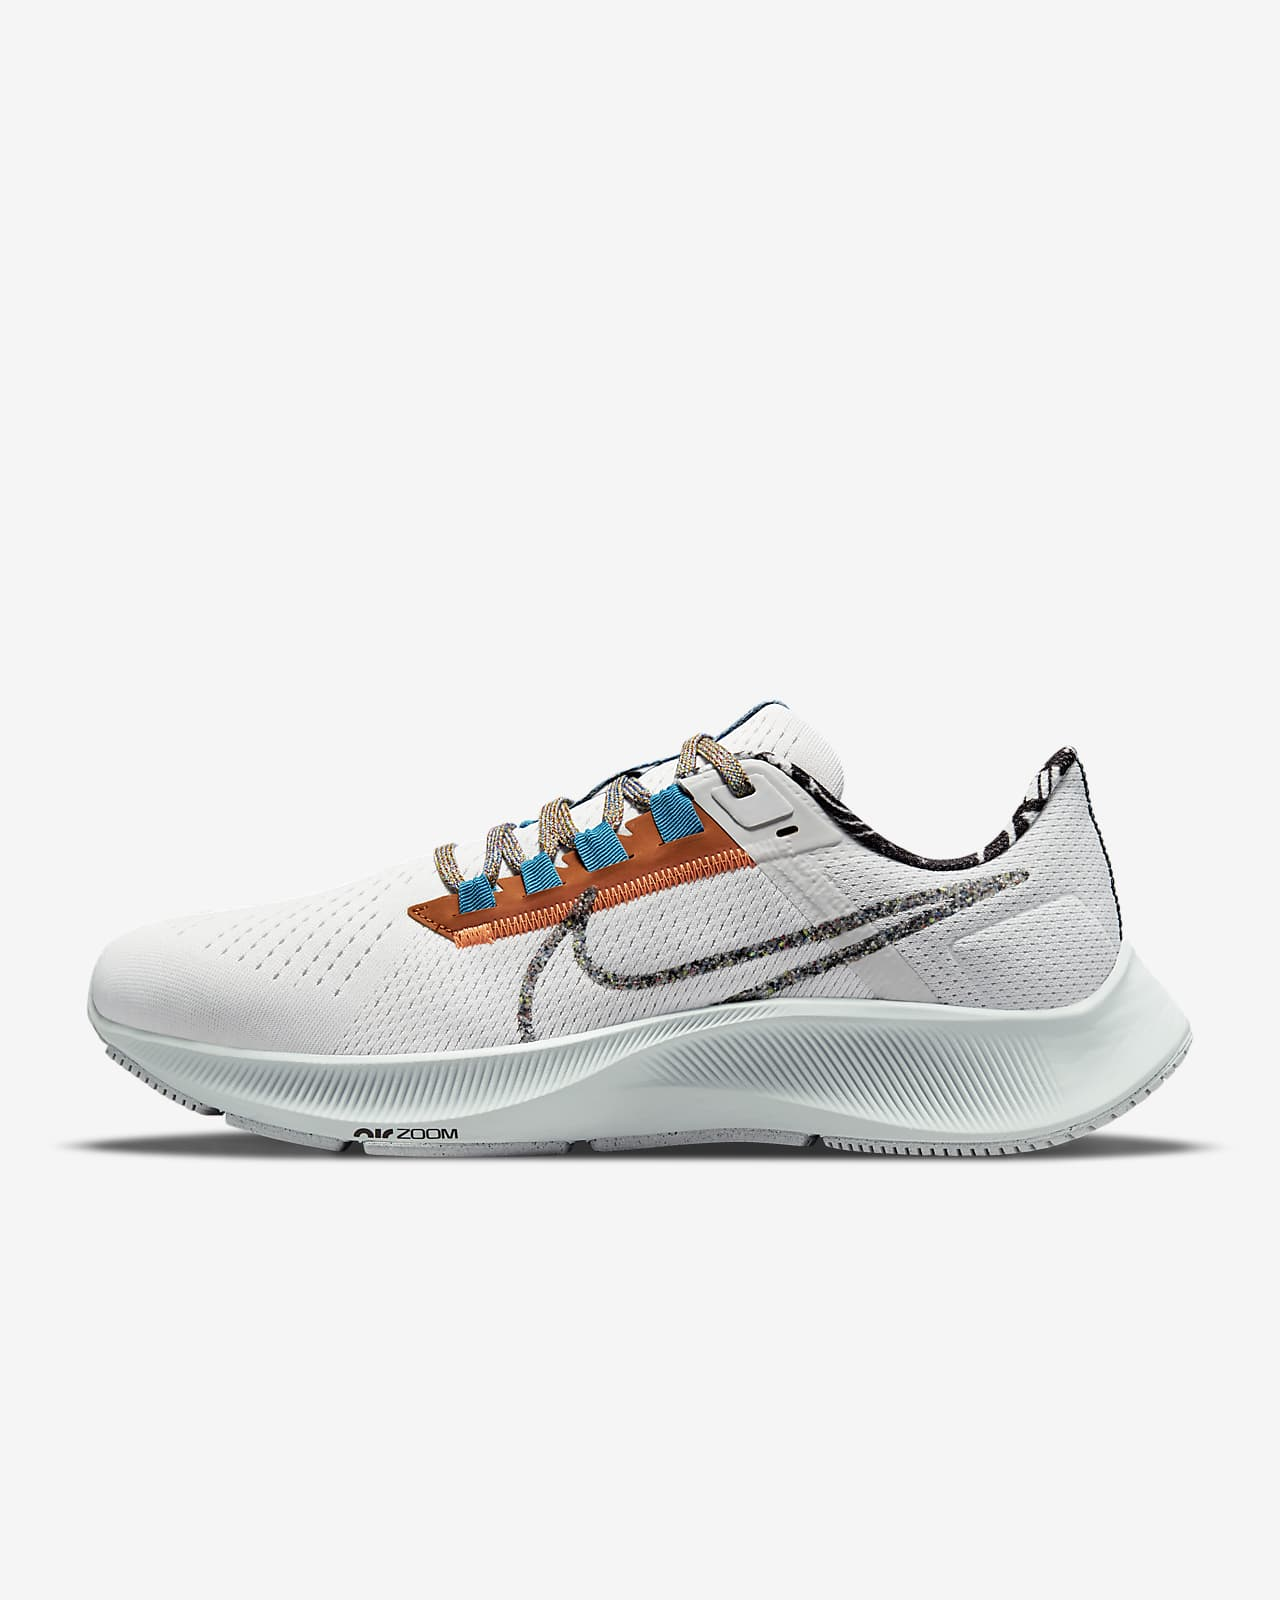 Chaussure de running Nike Air Zoom Pegasus 38 pour Homme. Nike LU